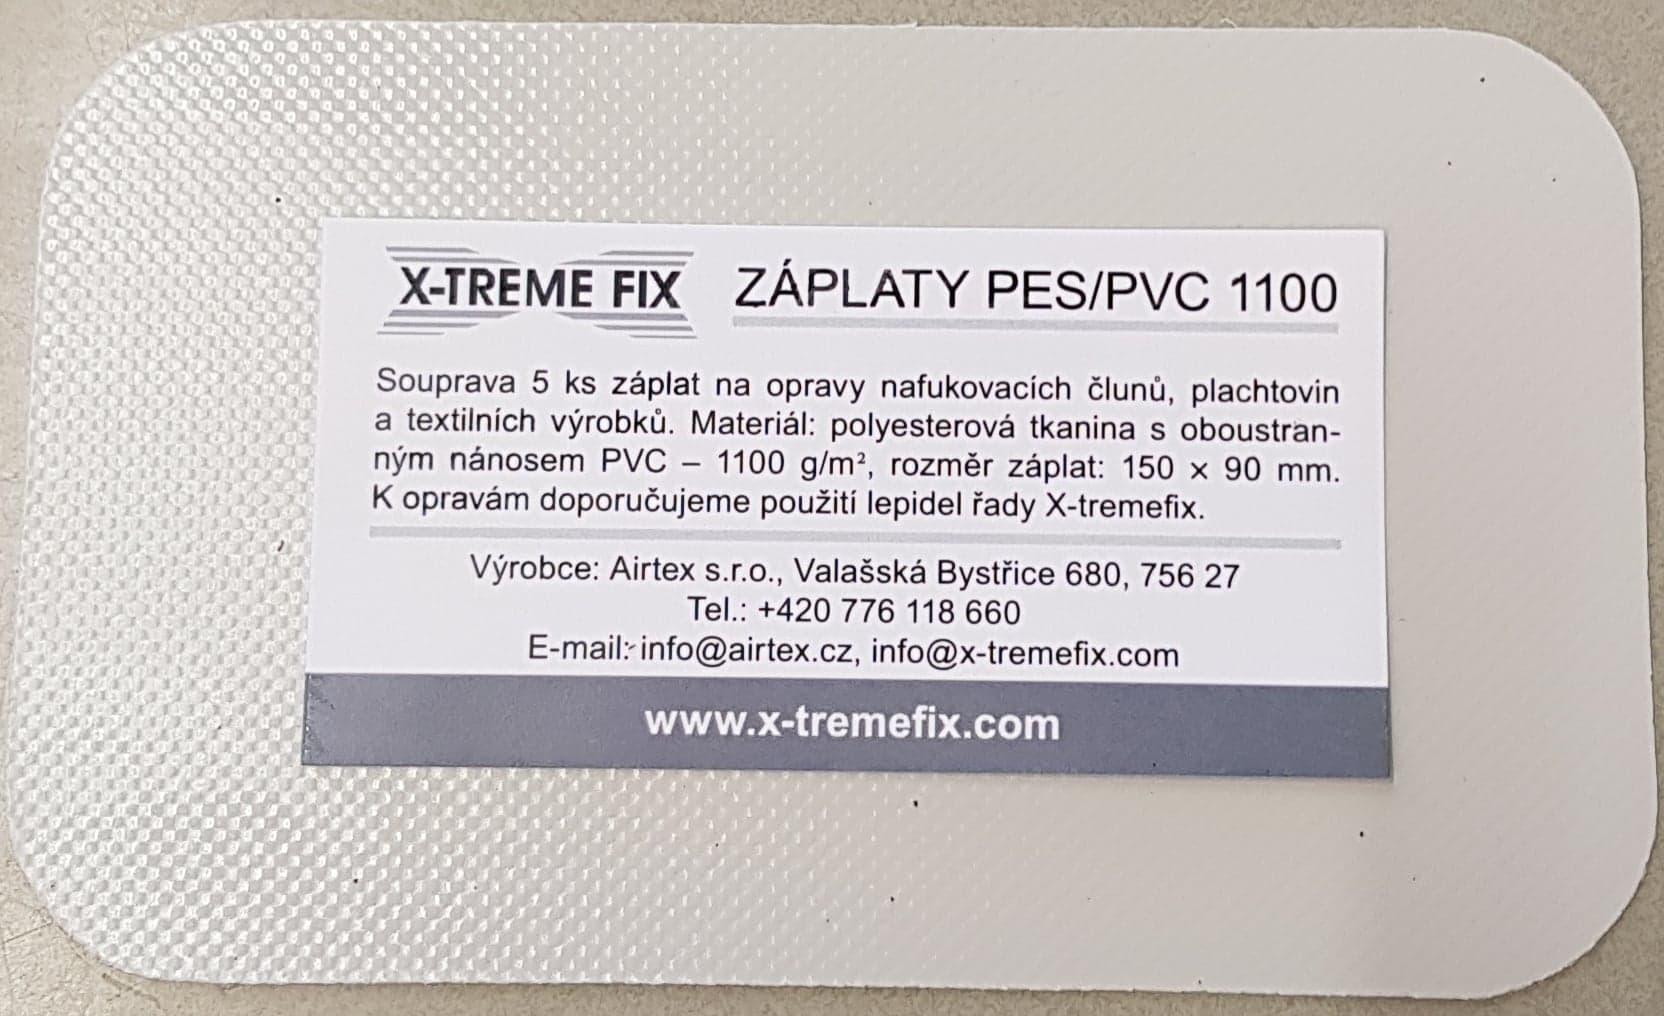 x-treme fix záplaty šedé.jpg